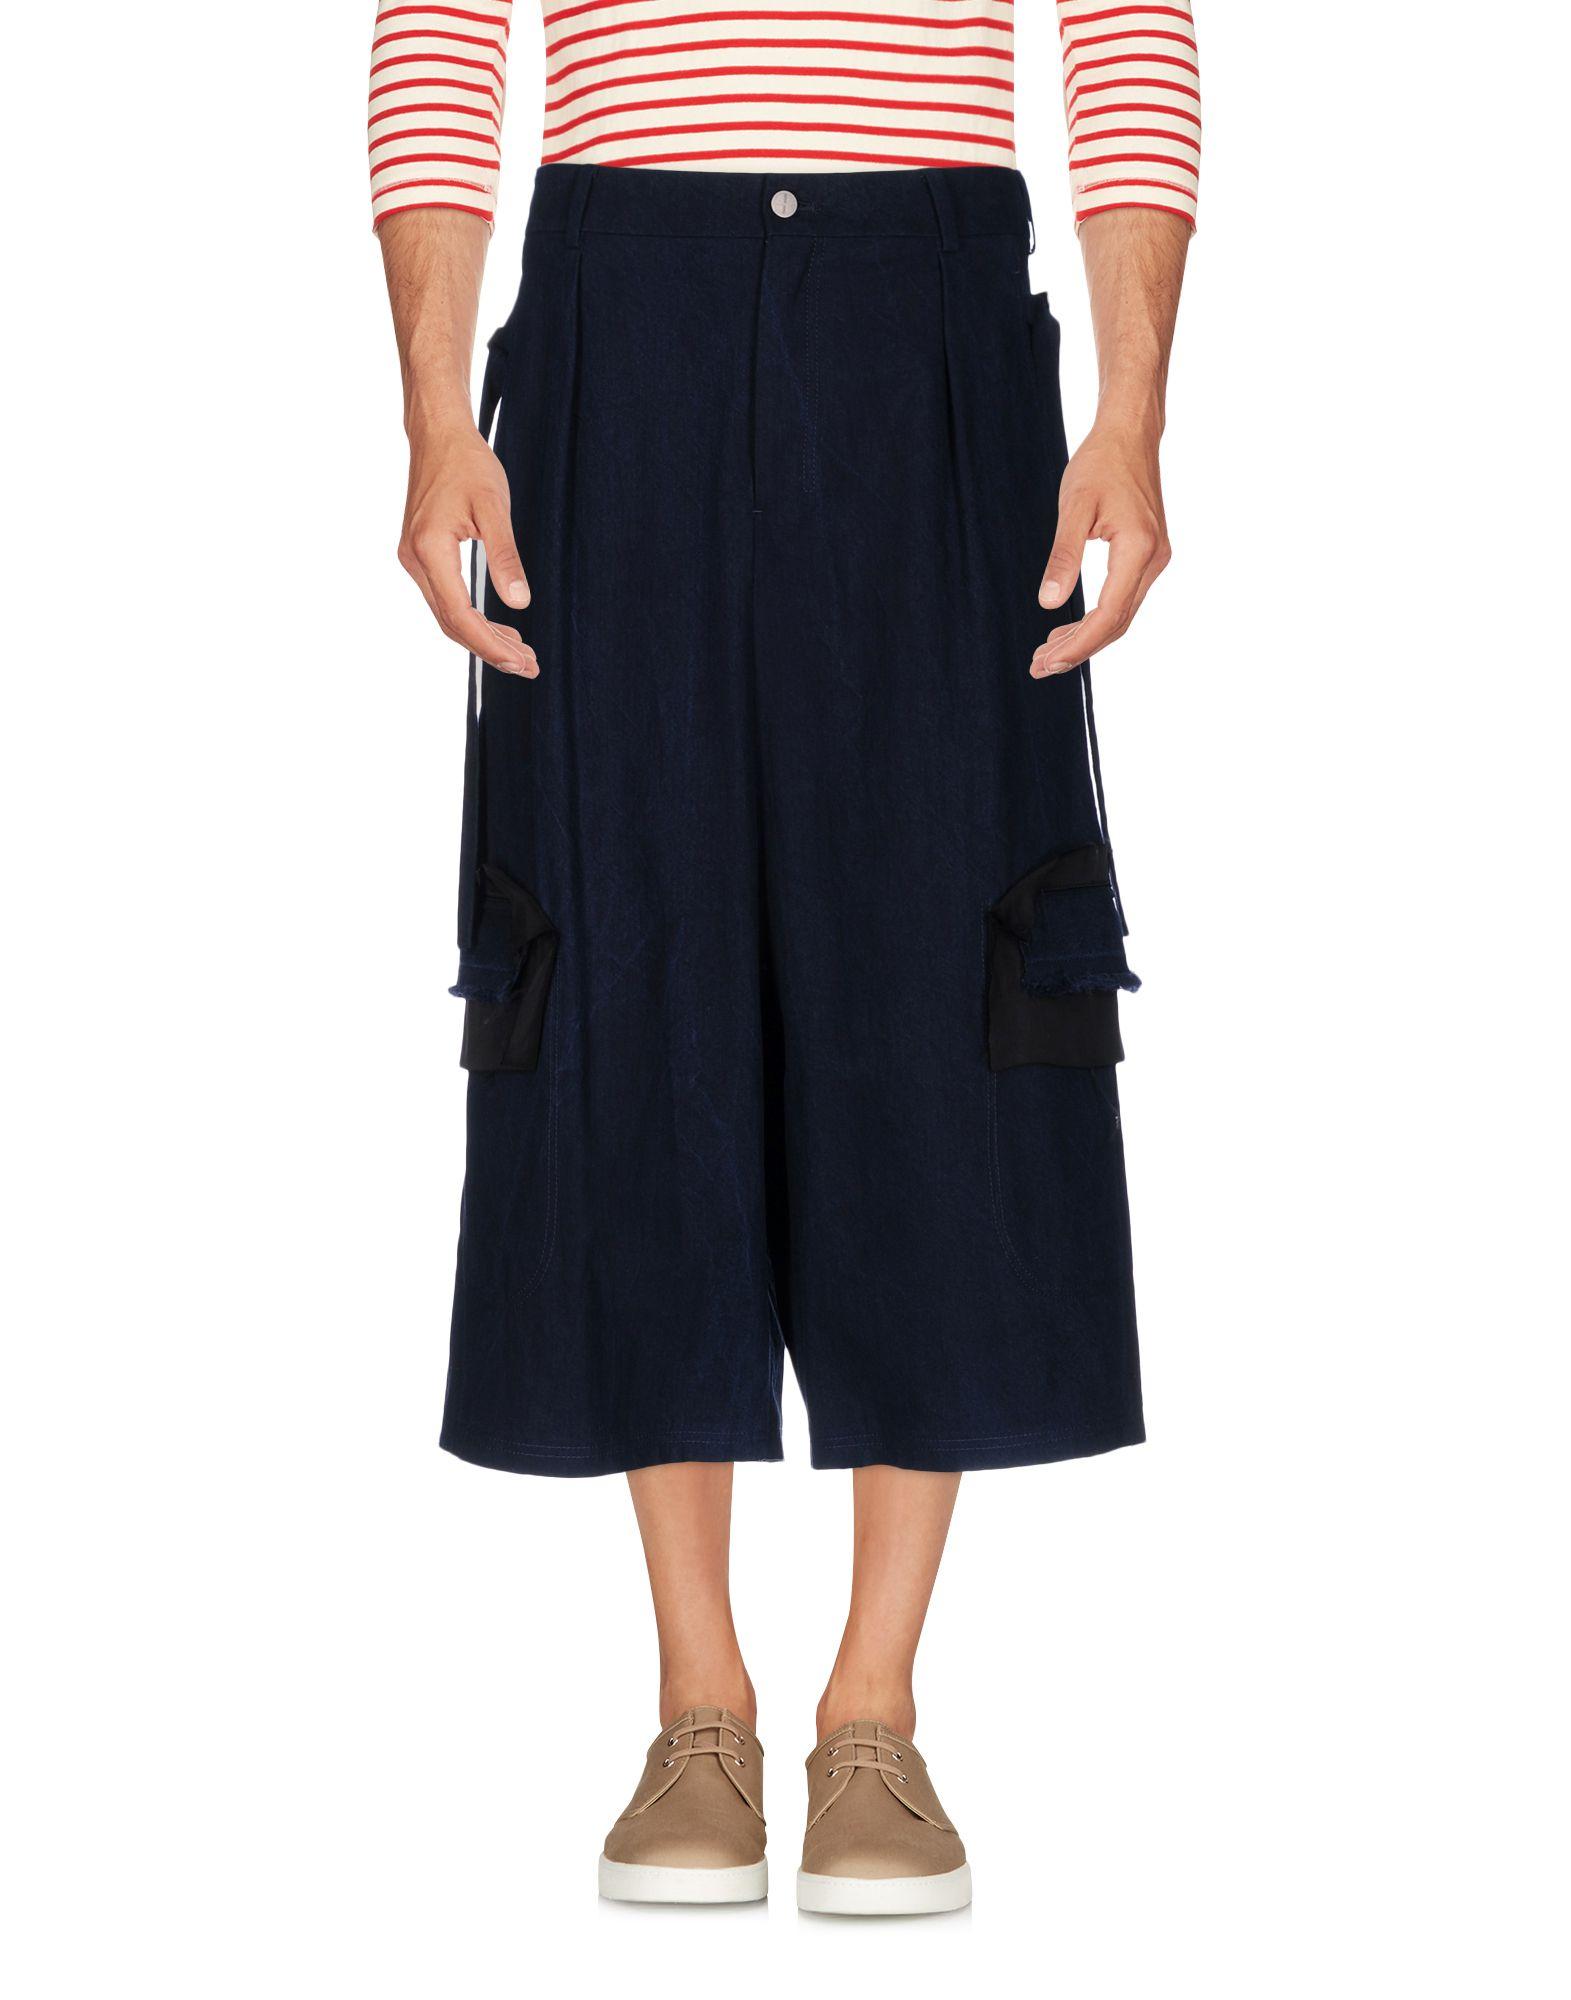 Pantaloni Jeans Damir Doma Uomo - Acquista online su